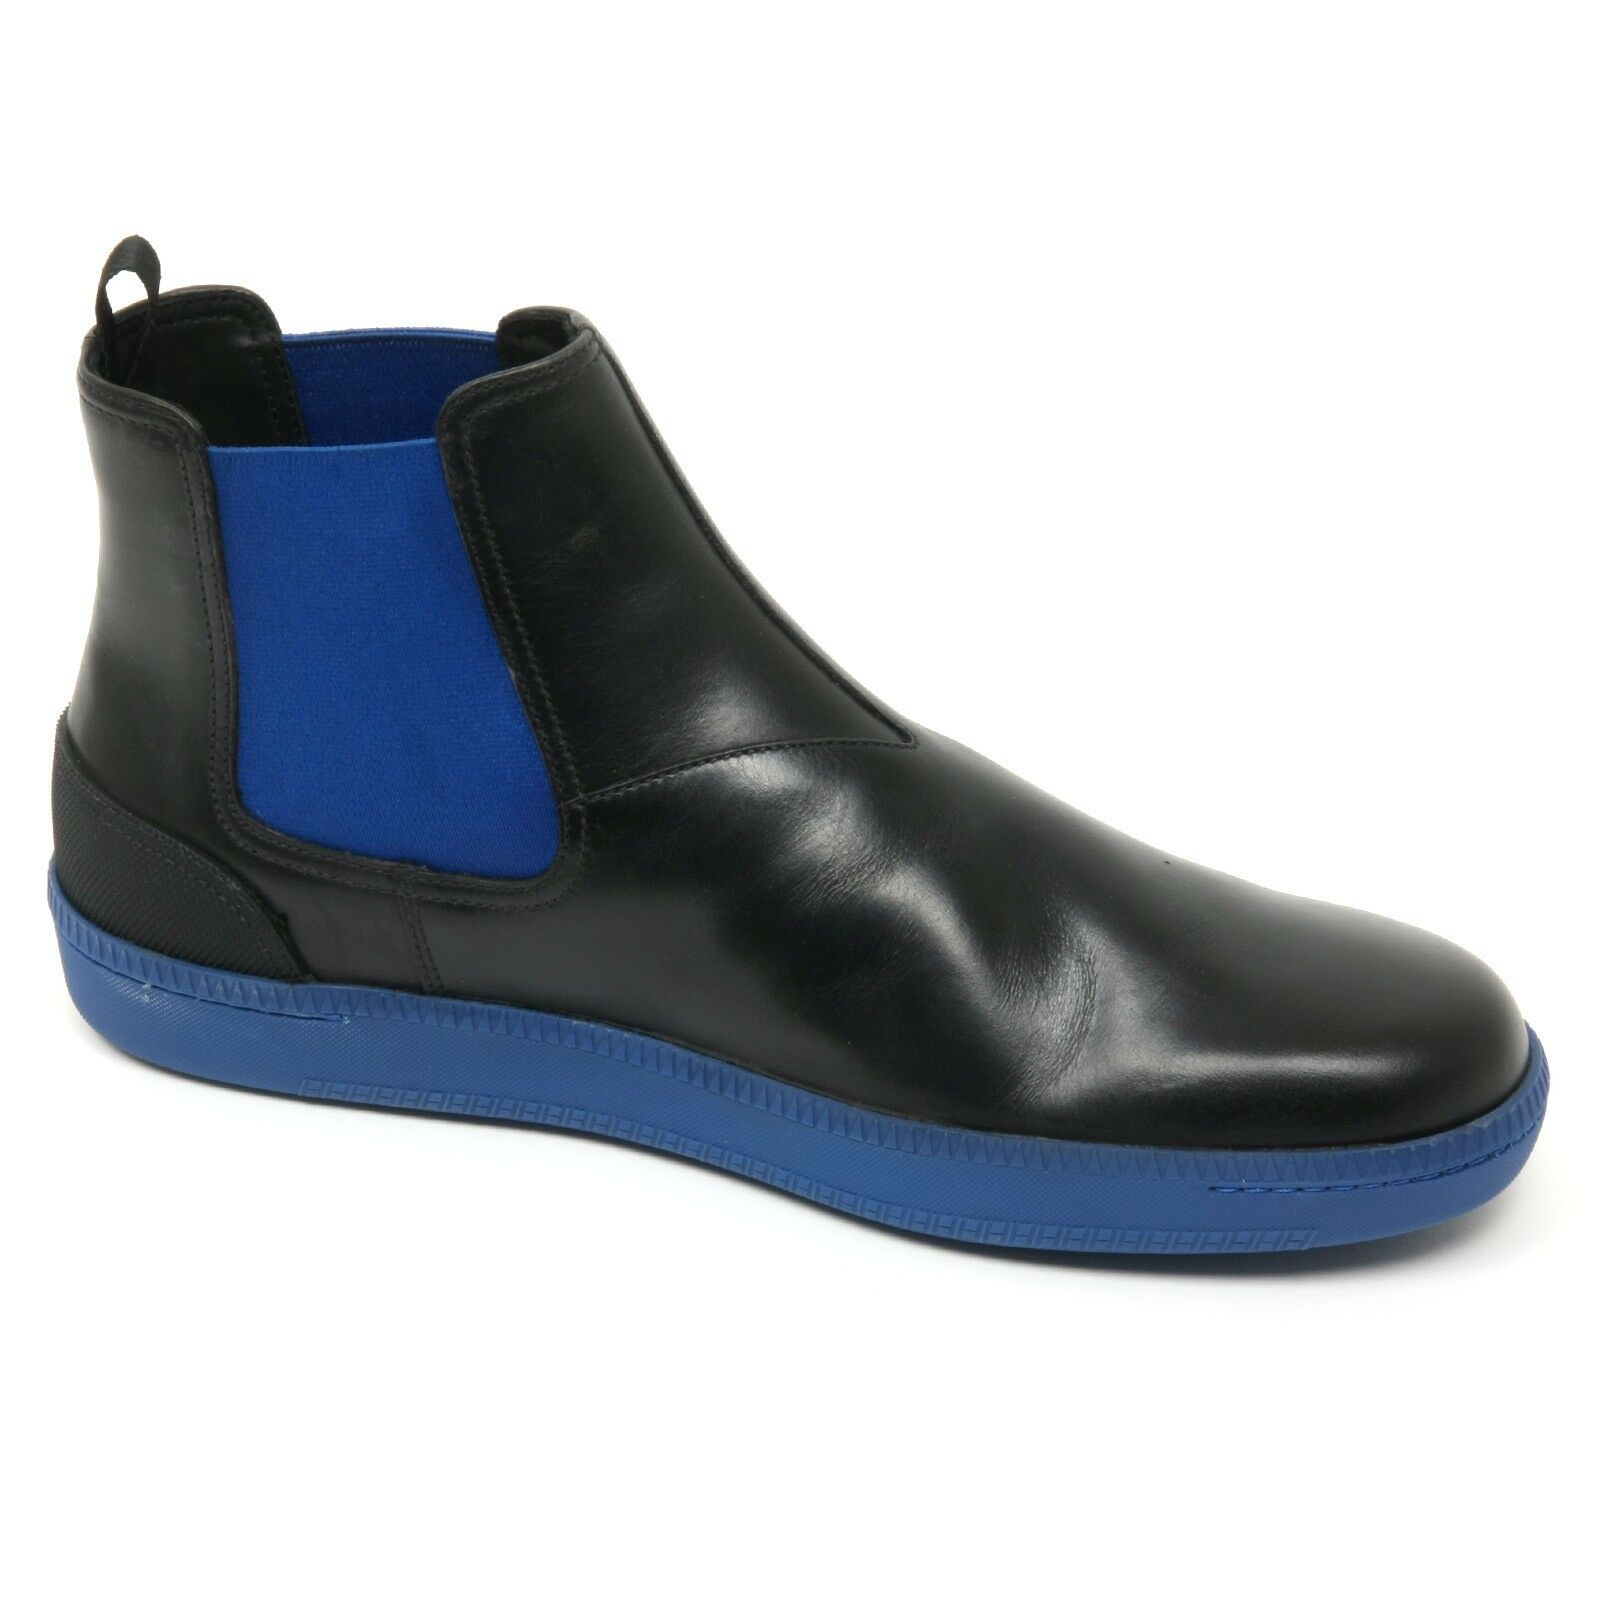 B8866 KUT810 polacchino uomo CAR SHOE KUT810 B8866 scarpa Blautte/nero boot shoe man cdb46b